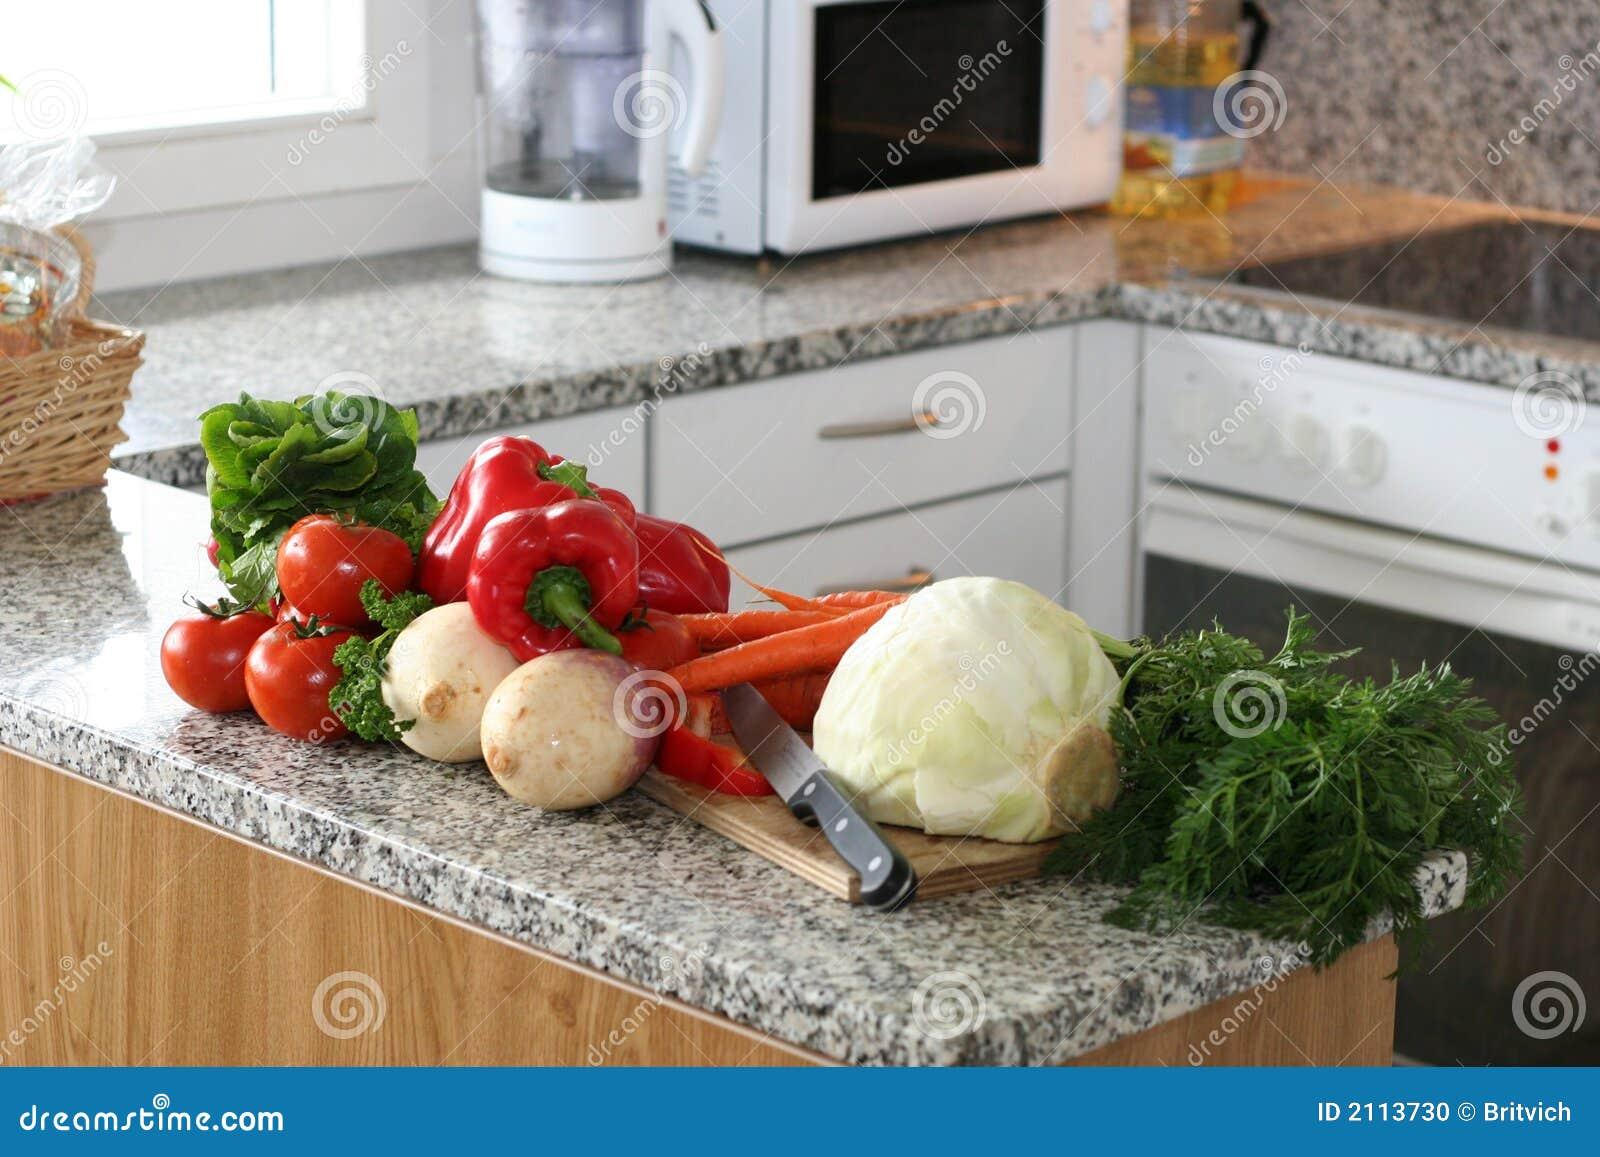 Kitchen setup with vegetables stock photo image 2113730 for Kitchen setup